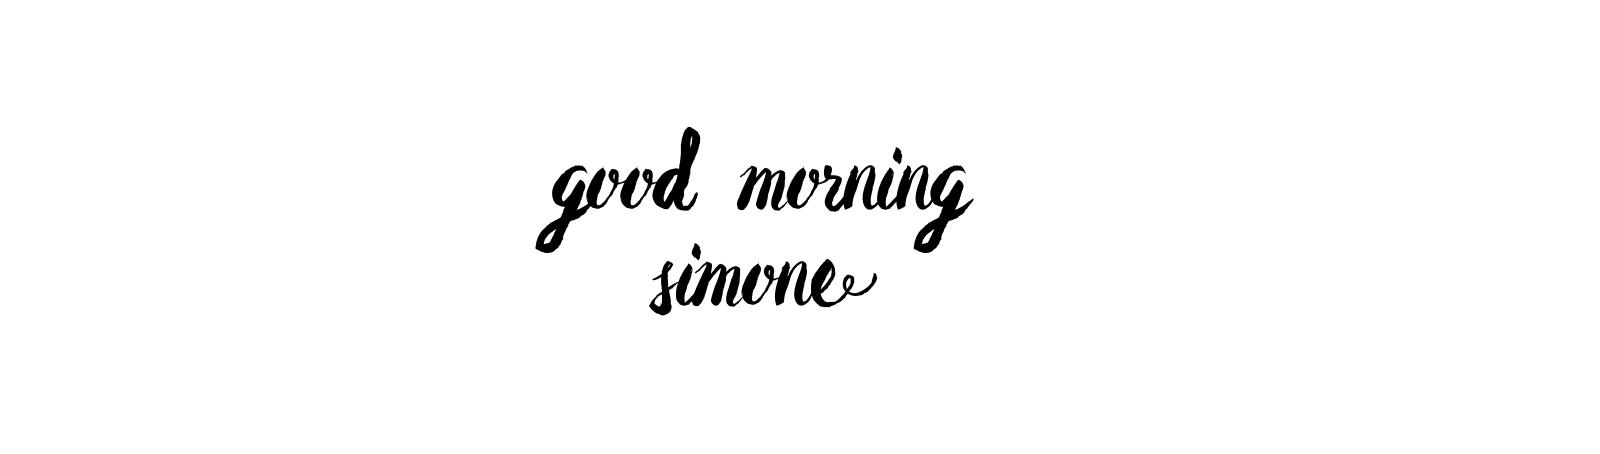 Good Morning Simone